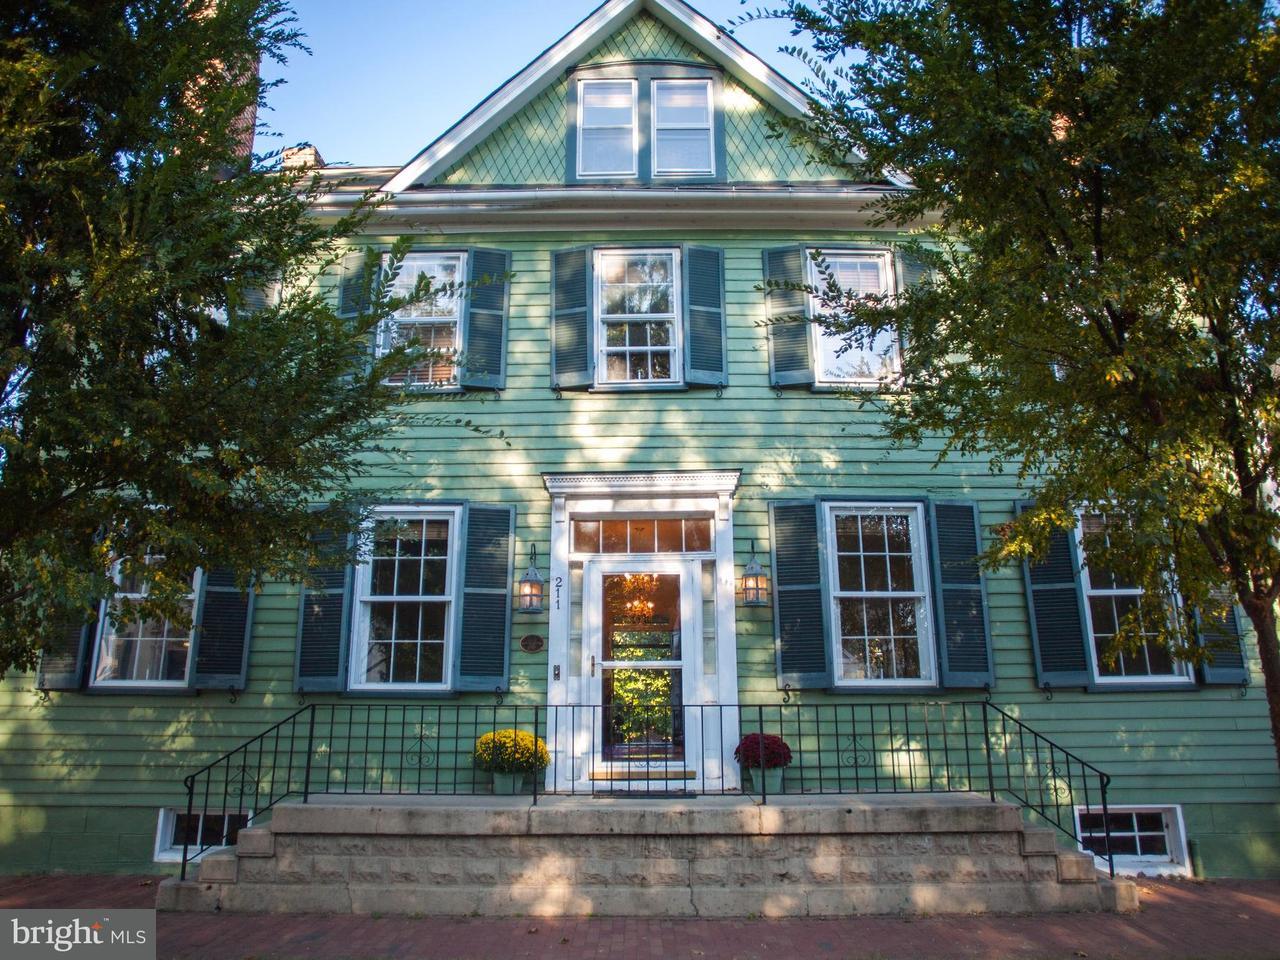 211 caroline street fredericksburg va 22401 mls for Fredericksburg va cabin rentals